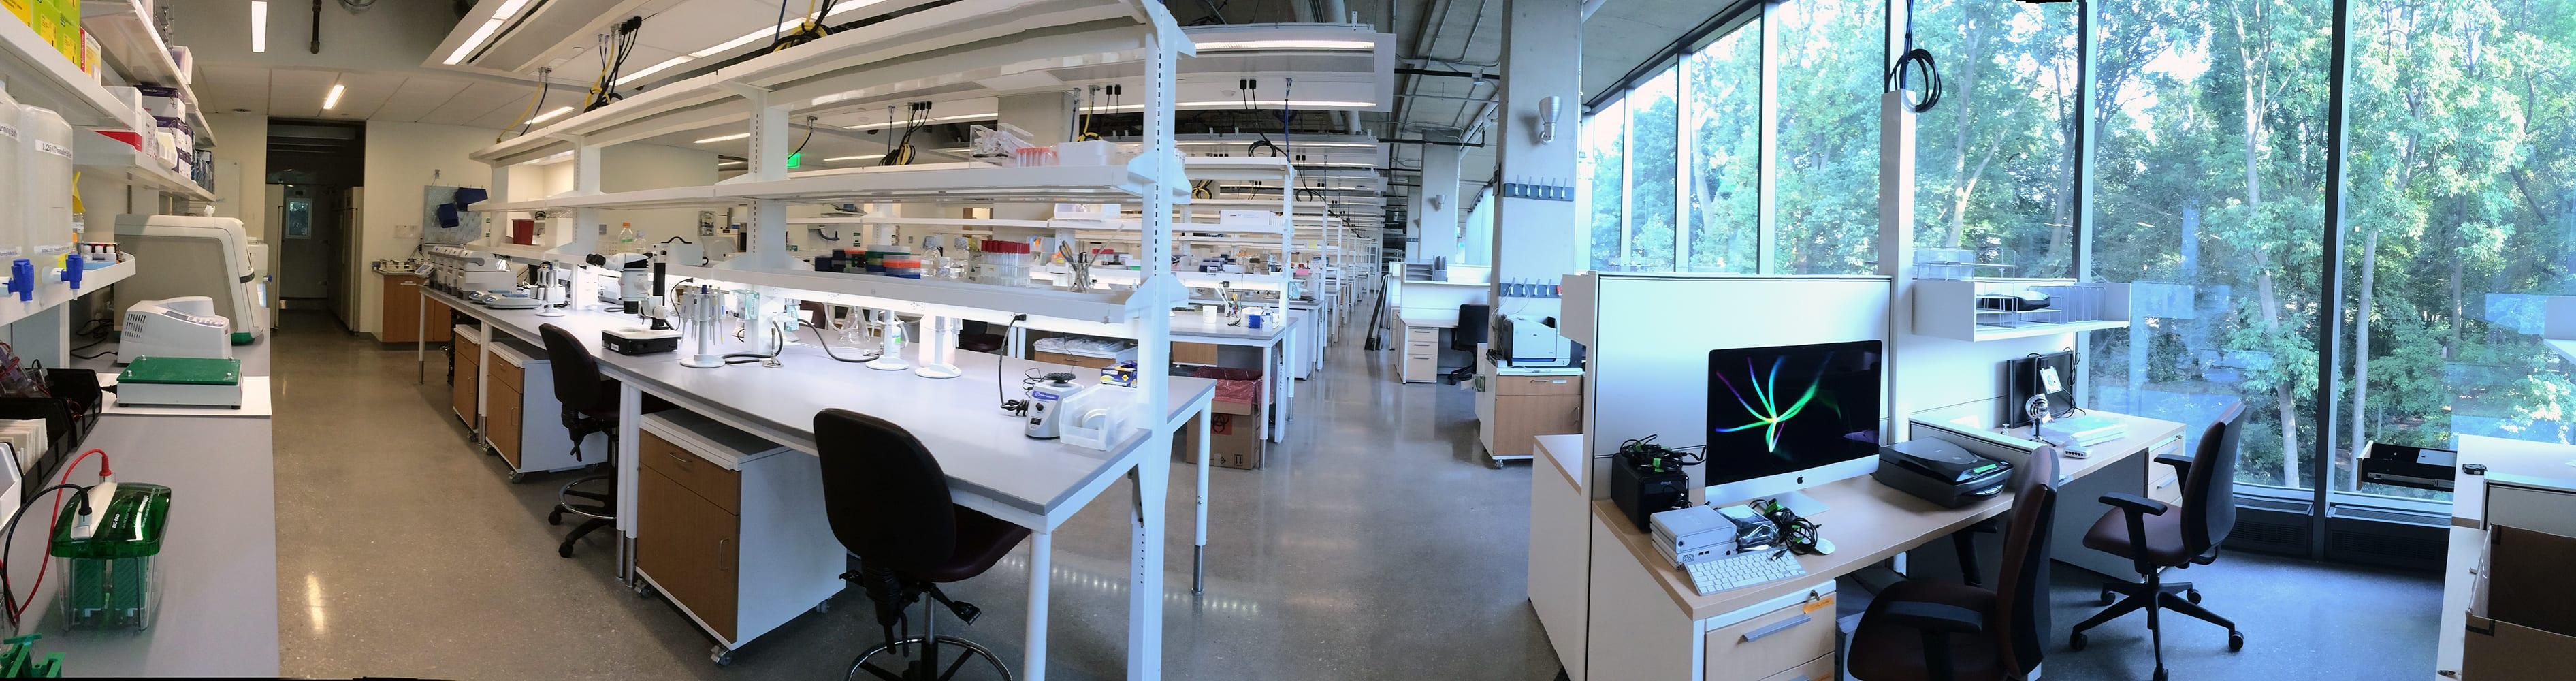 inside_lab